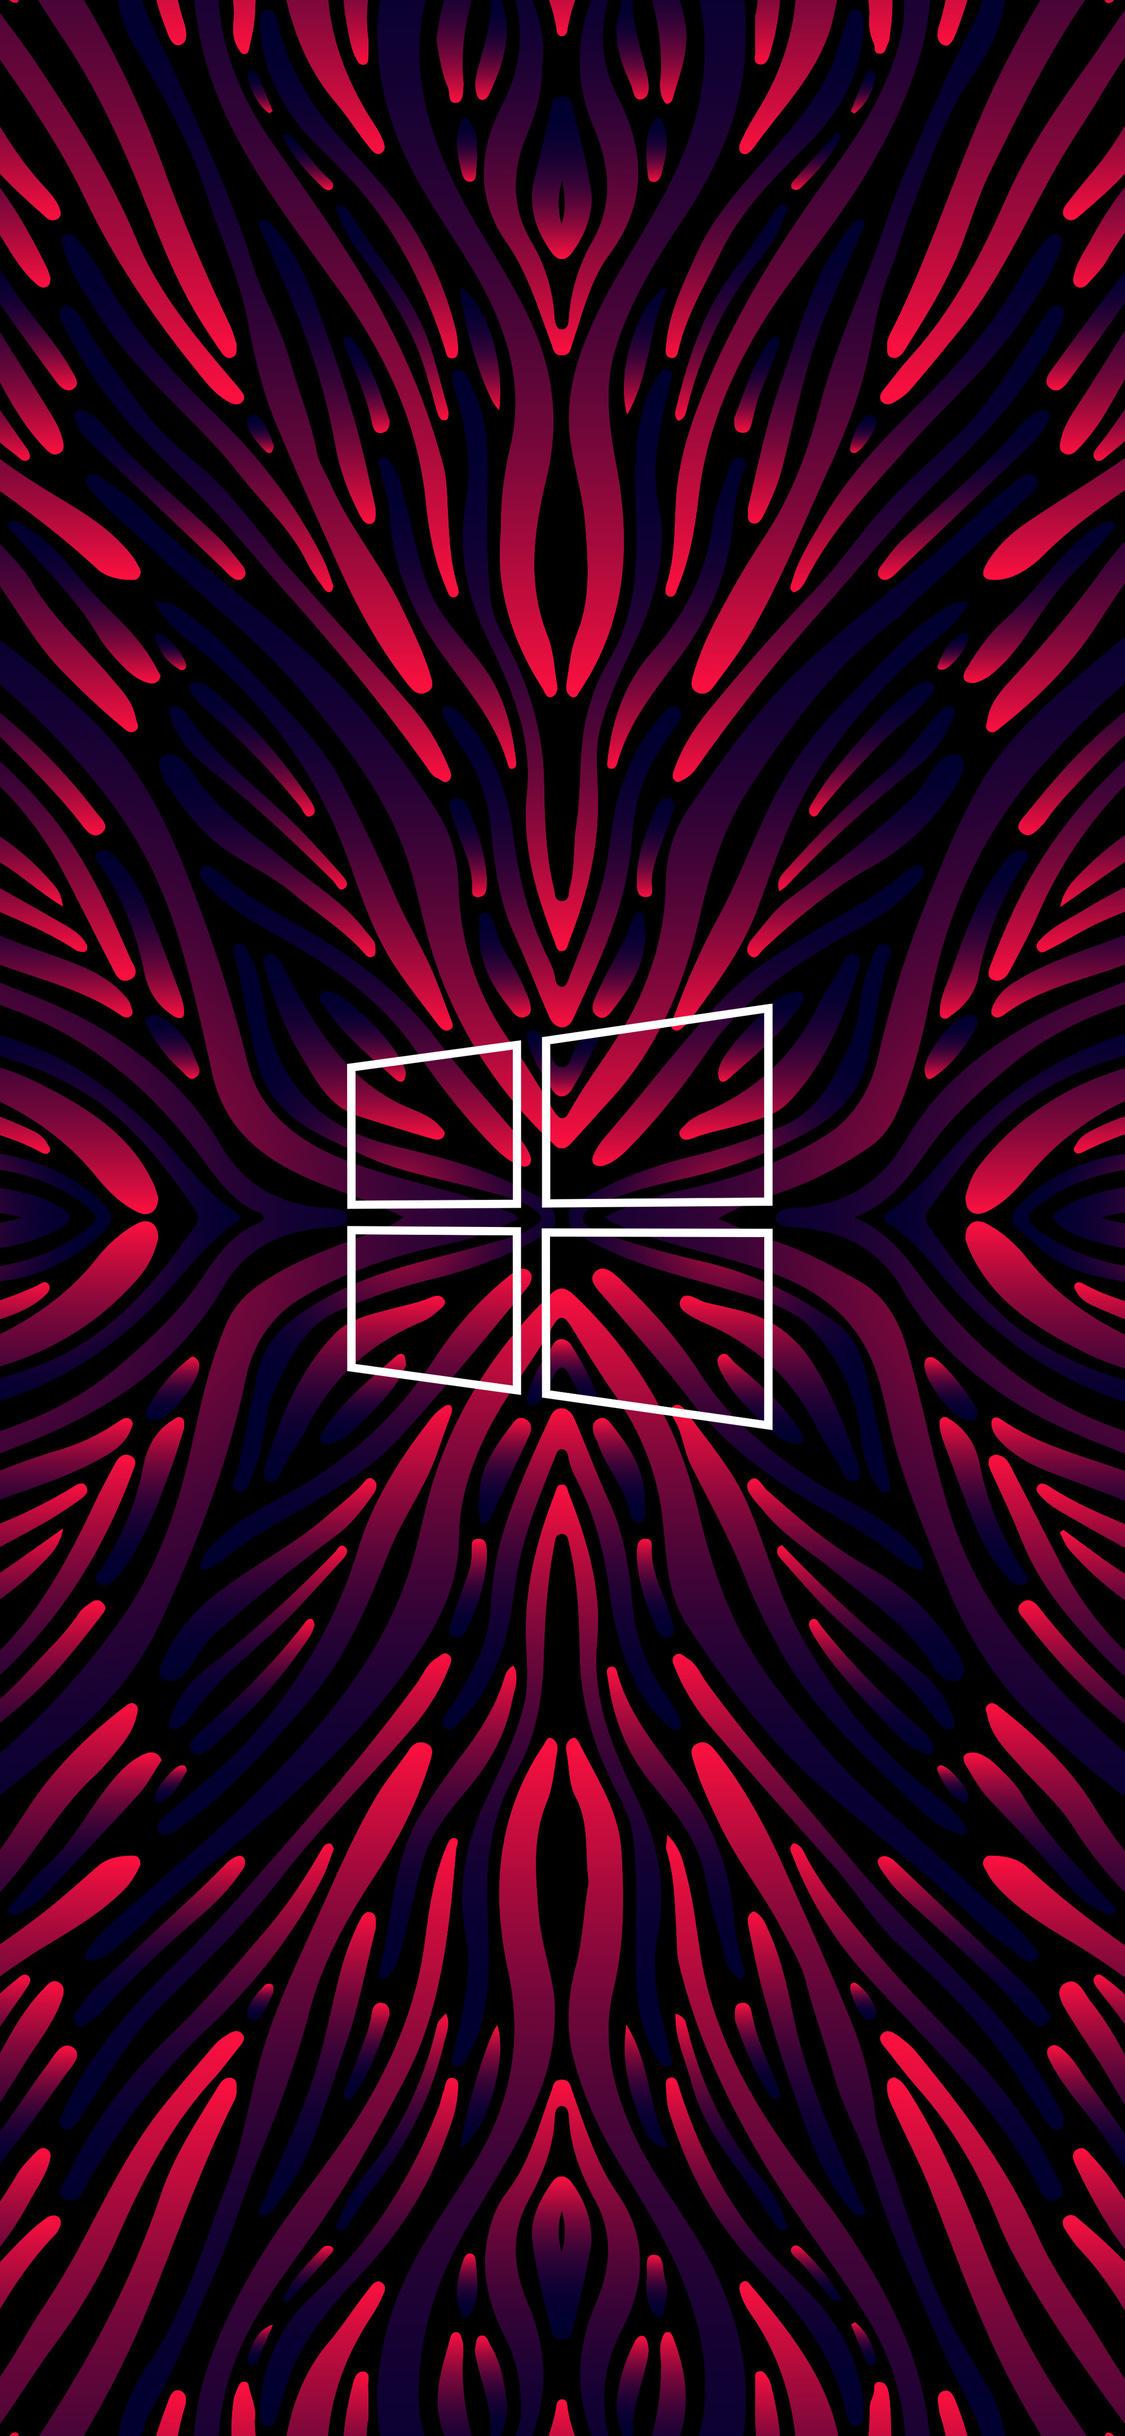 windows-logo-digital-art-8k-pv.jpg